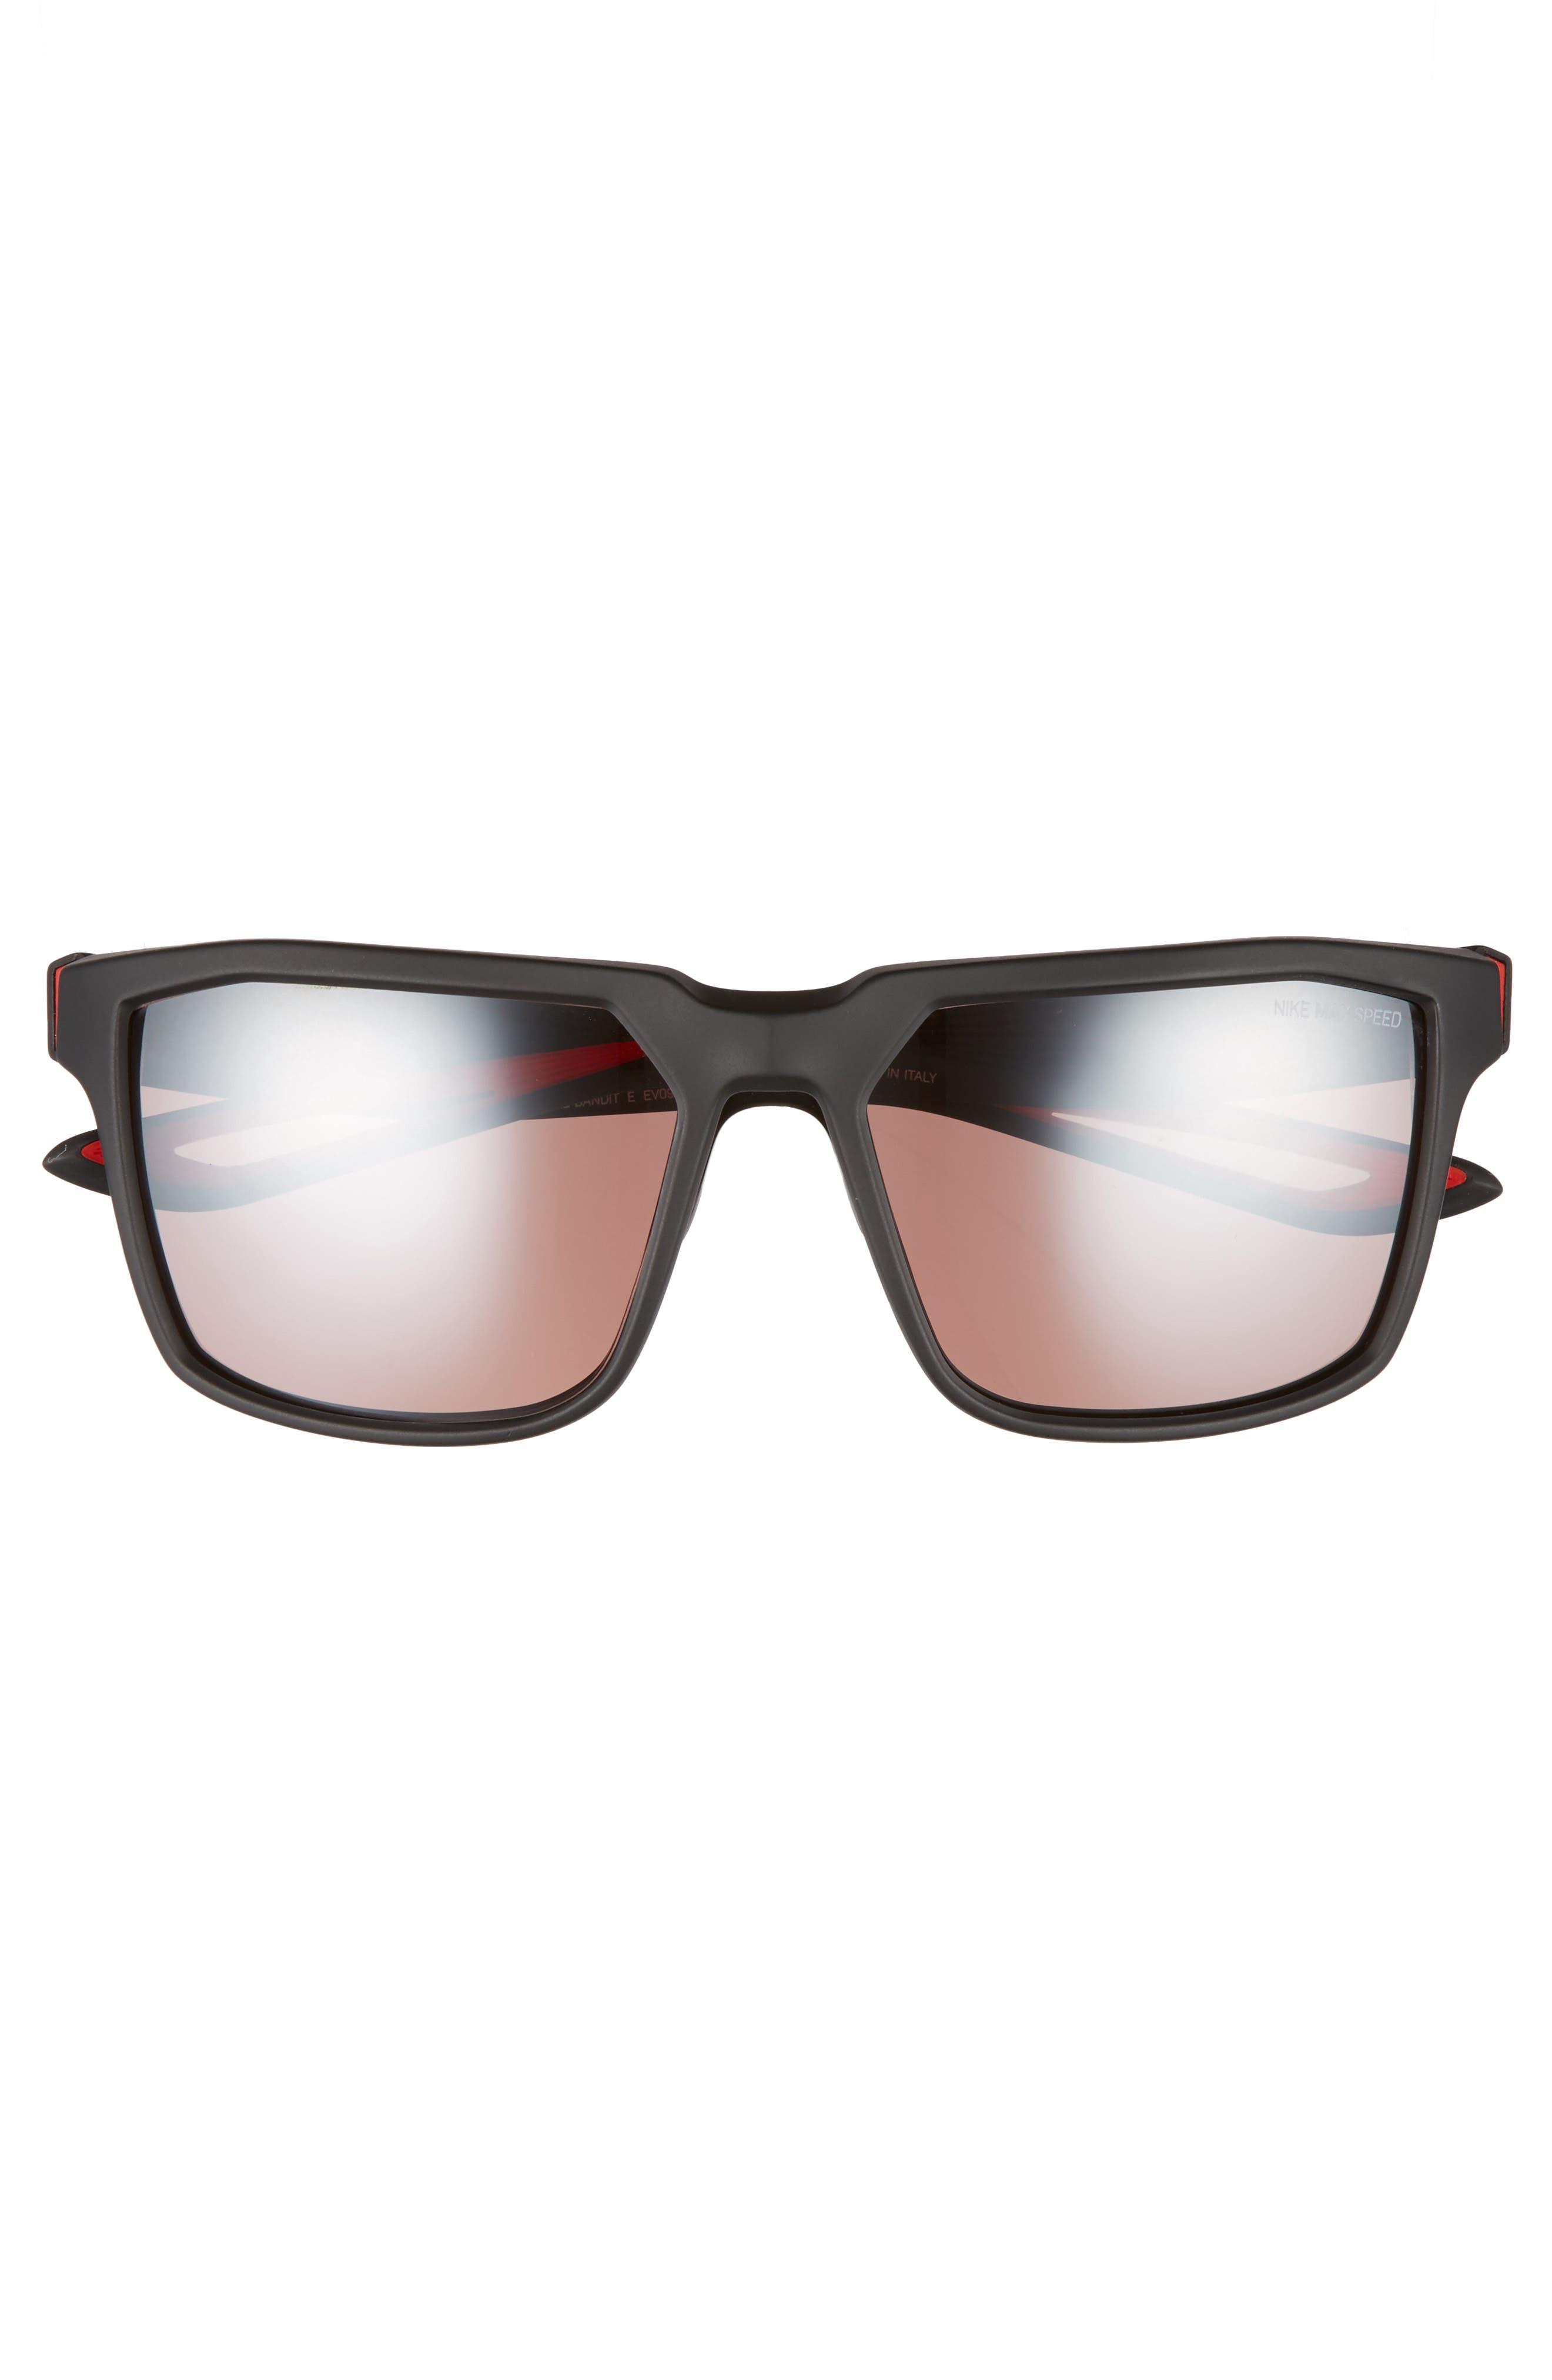 Bandit E 59mm Running Sunglasses,                             Alternate thumbnail 2, color,                             001